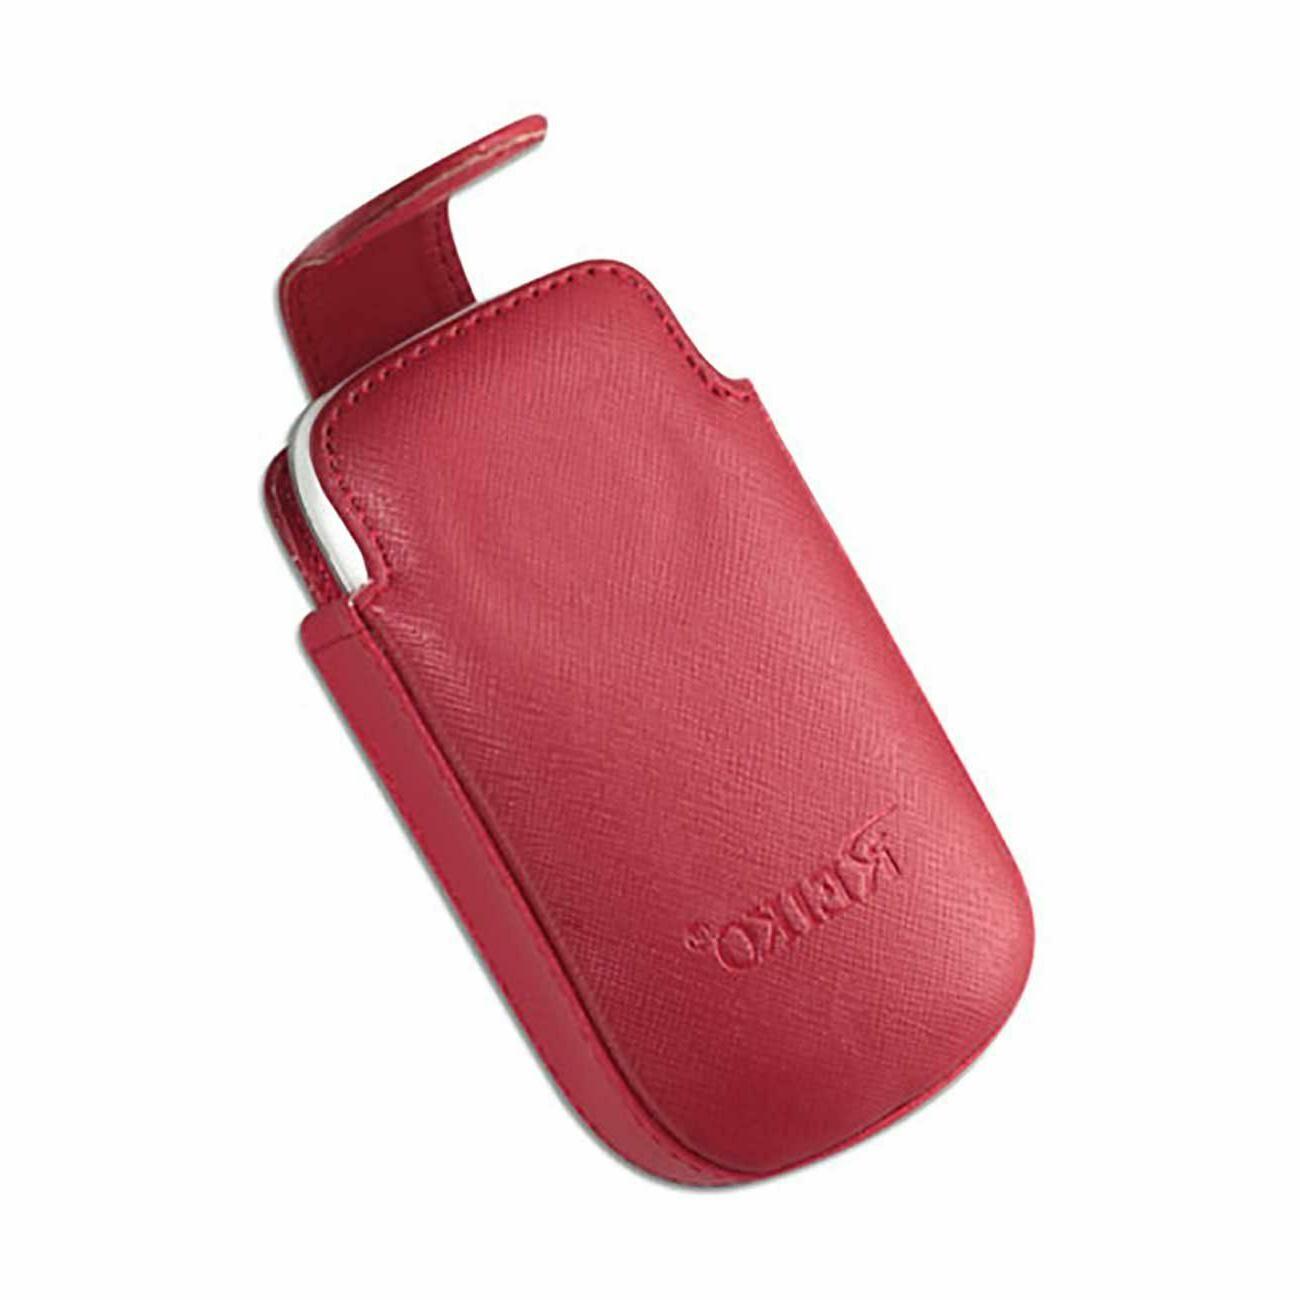 Red Leather fits SC729 Senior flip phone